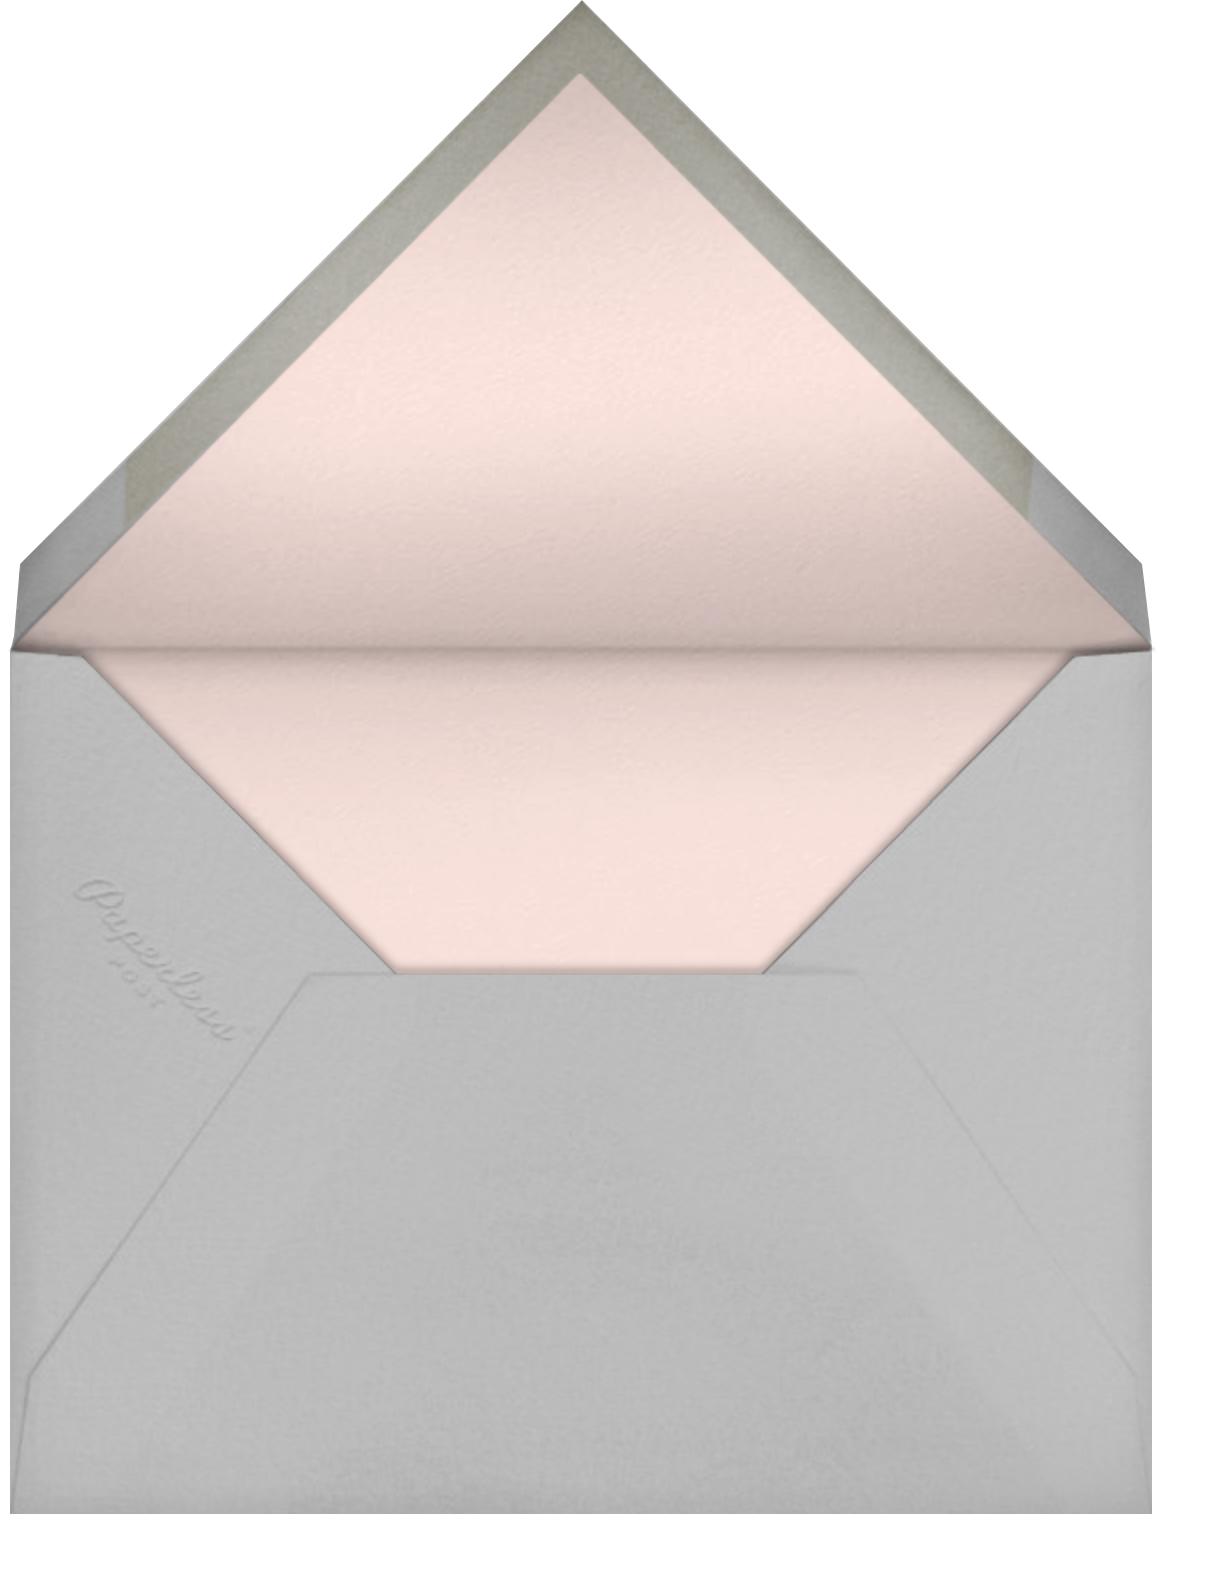 Lina - Meringue - Paperless Post - Engagement party - envelope back